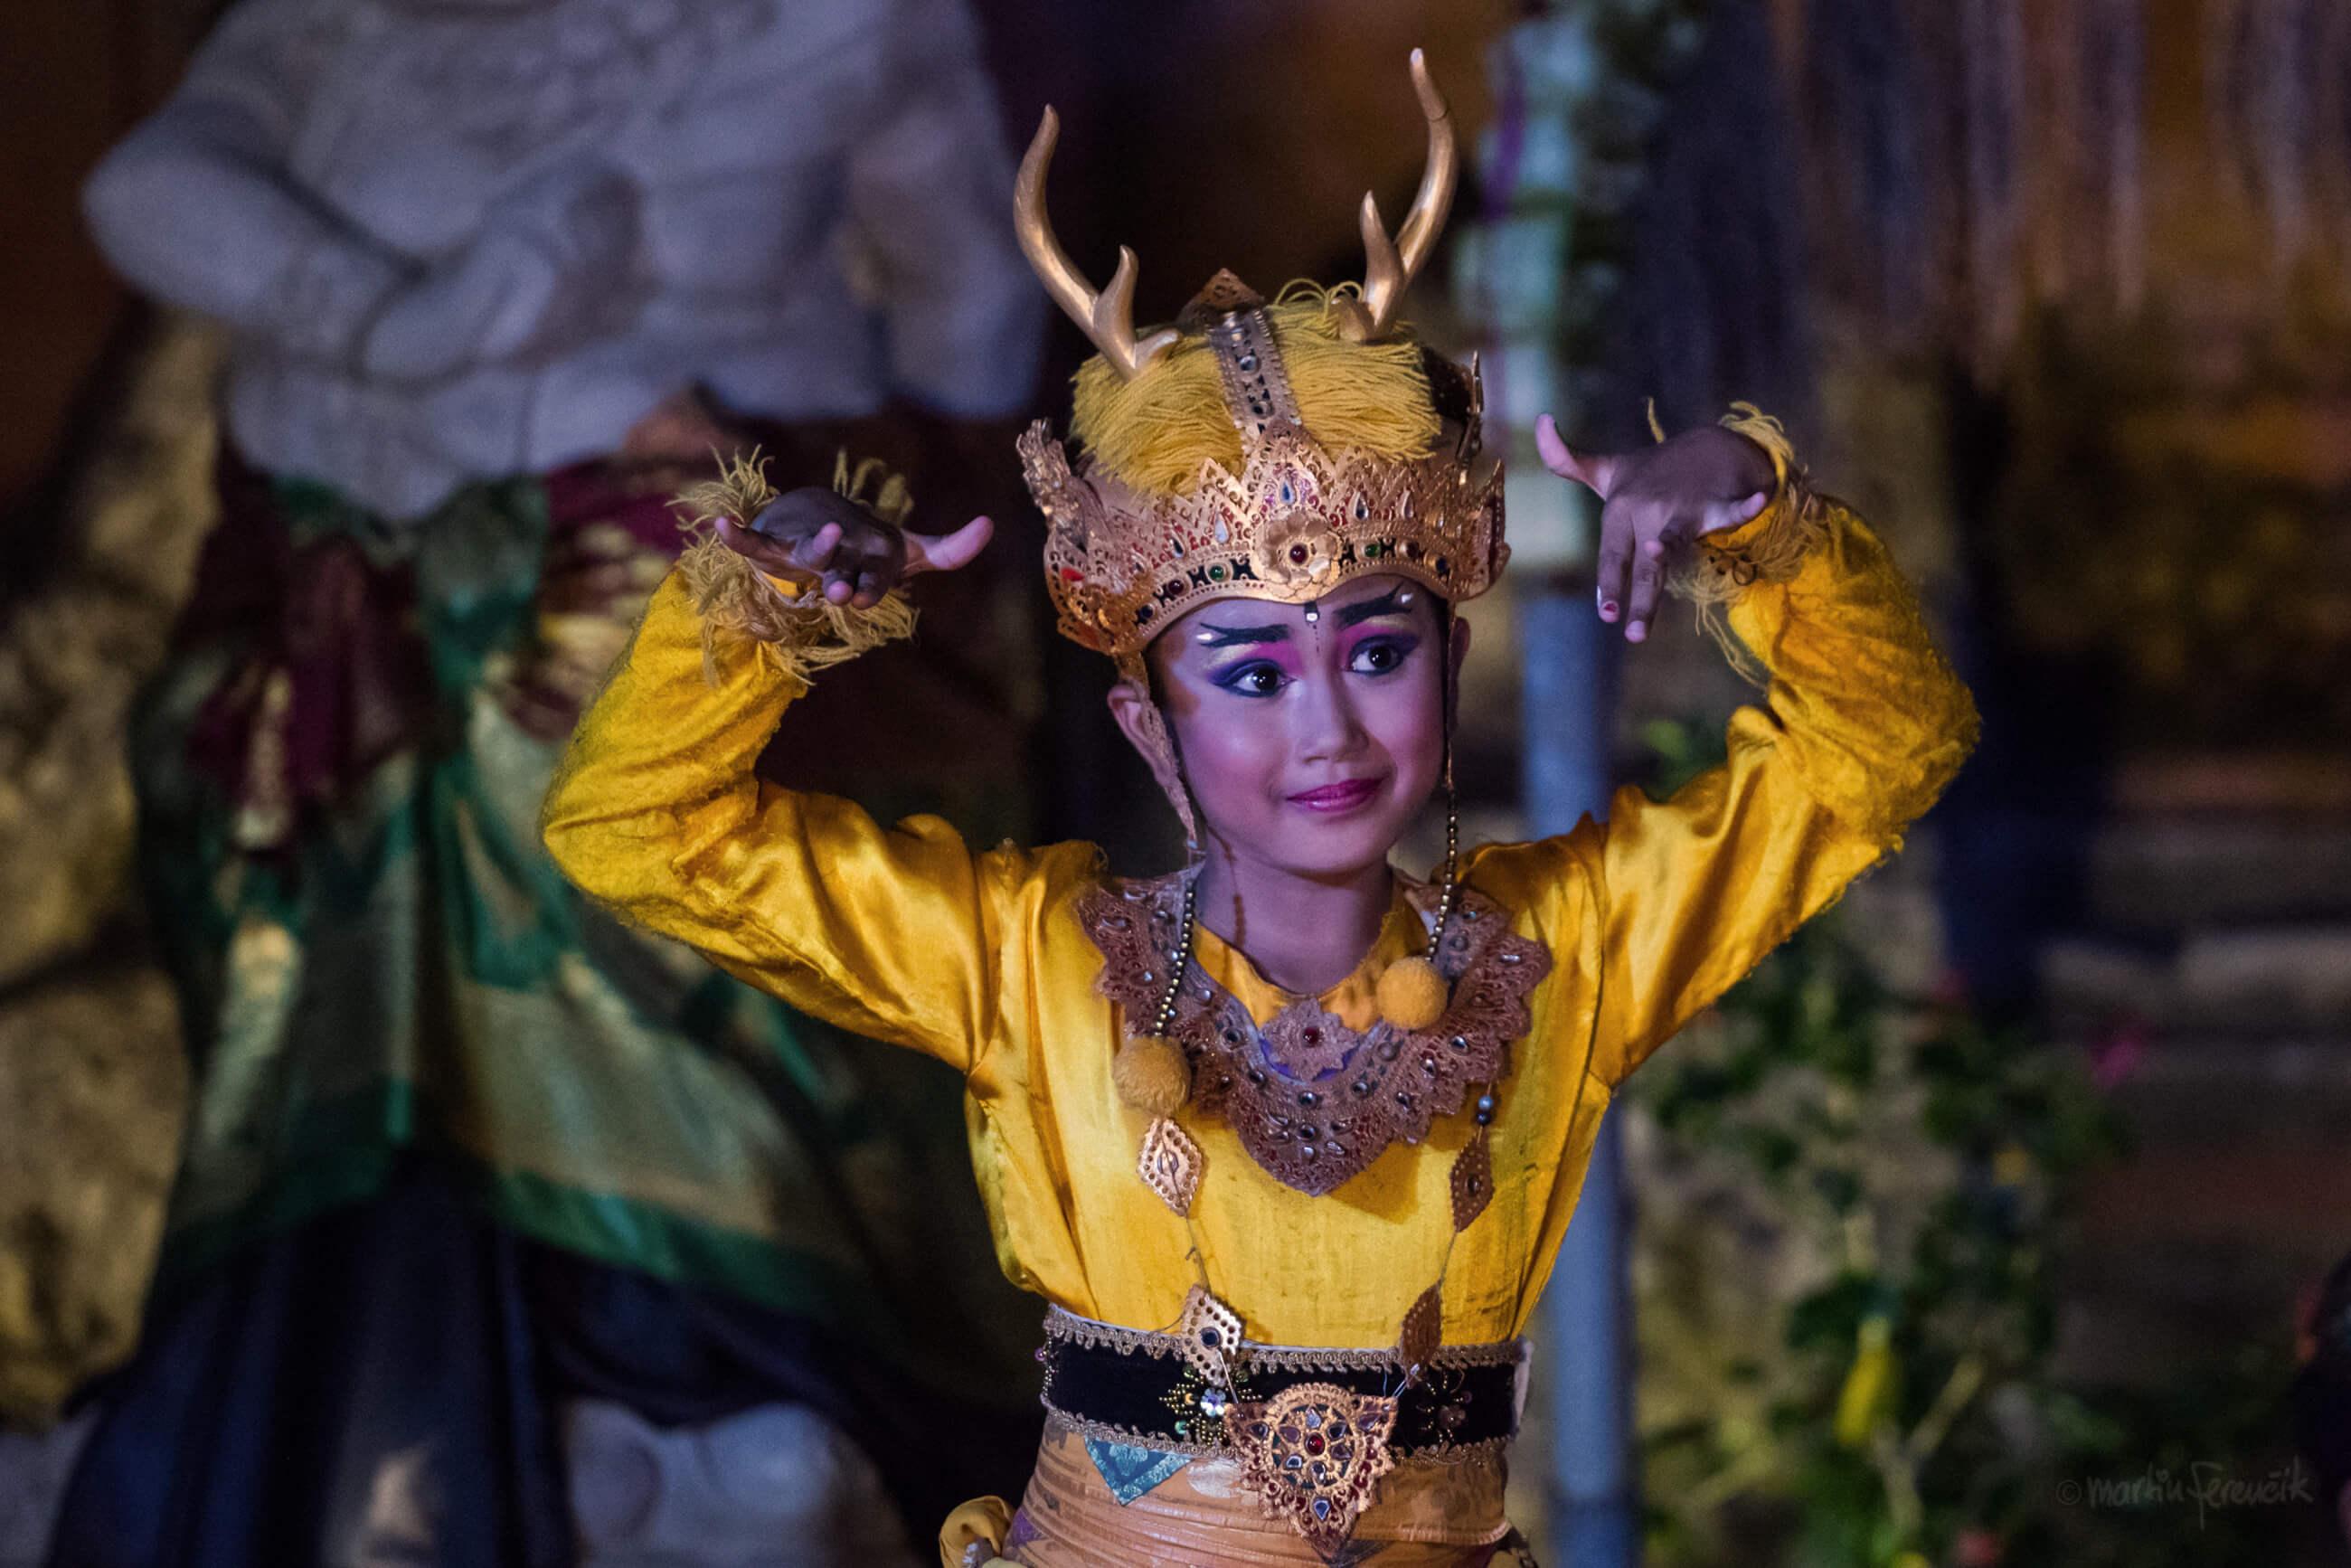 https://bubo.sk/uploads/galleries/7304/martinferencik_indonezia_bali_tanecnica.jpg